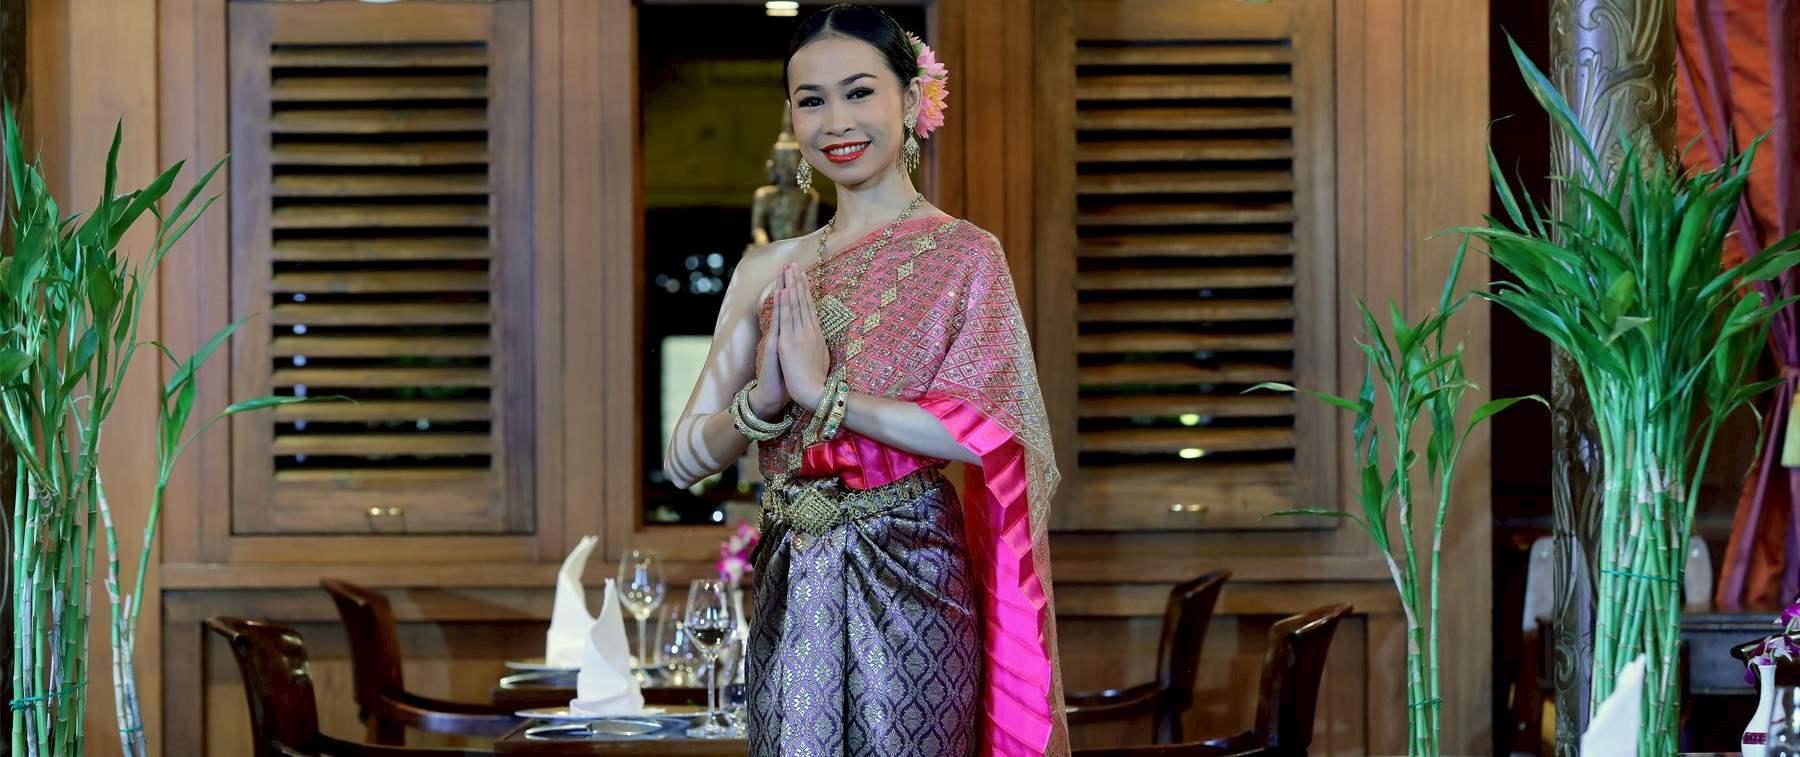 a lady with tea